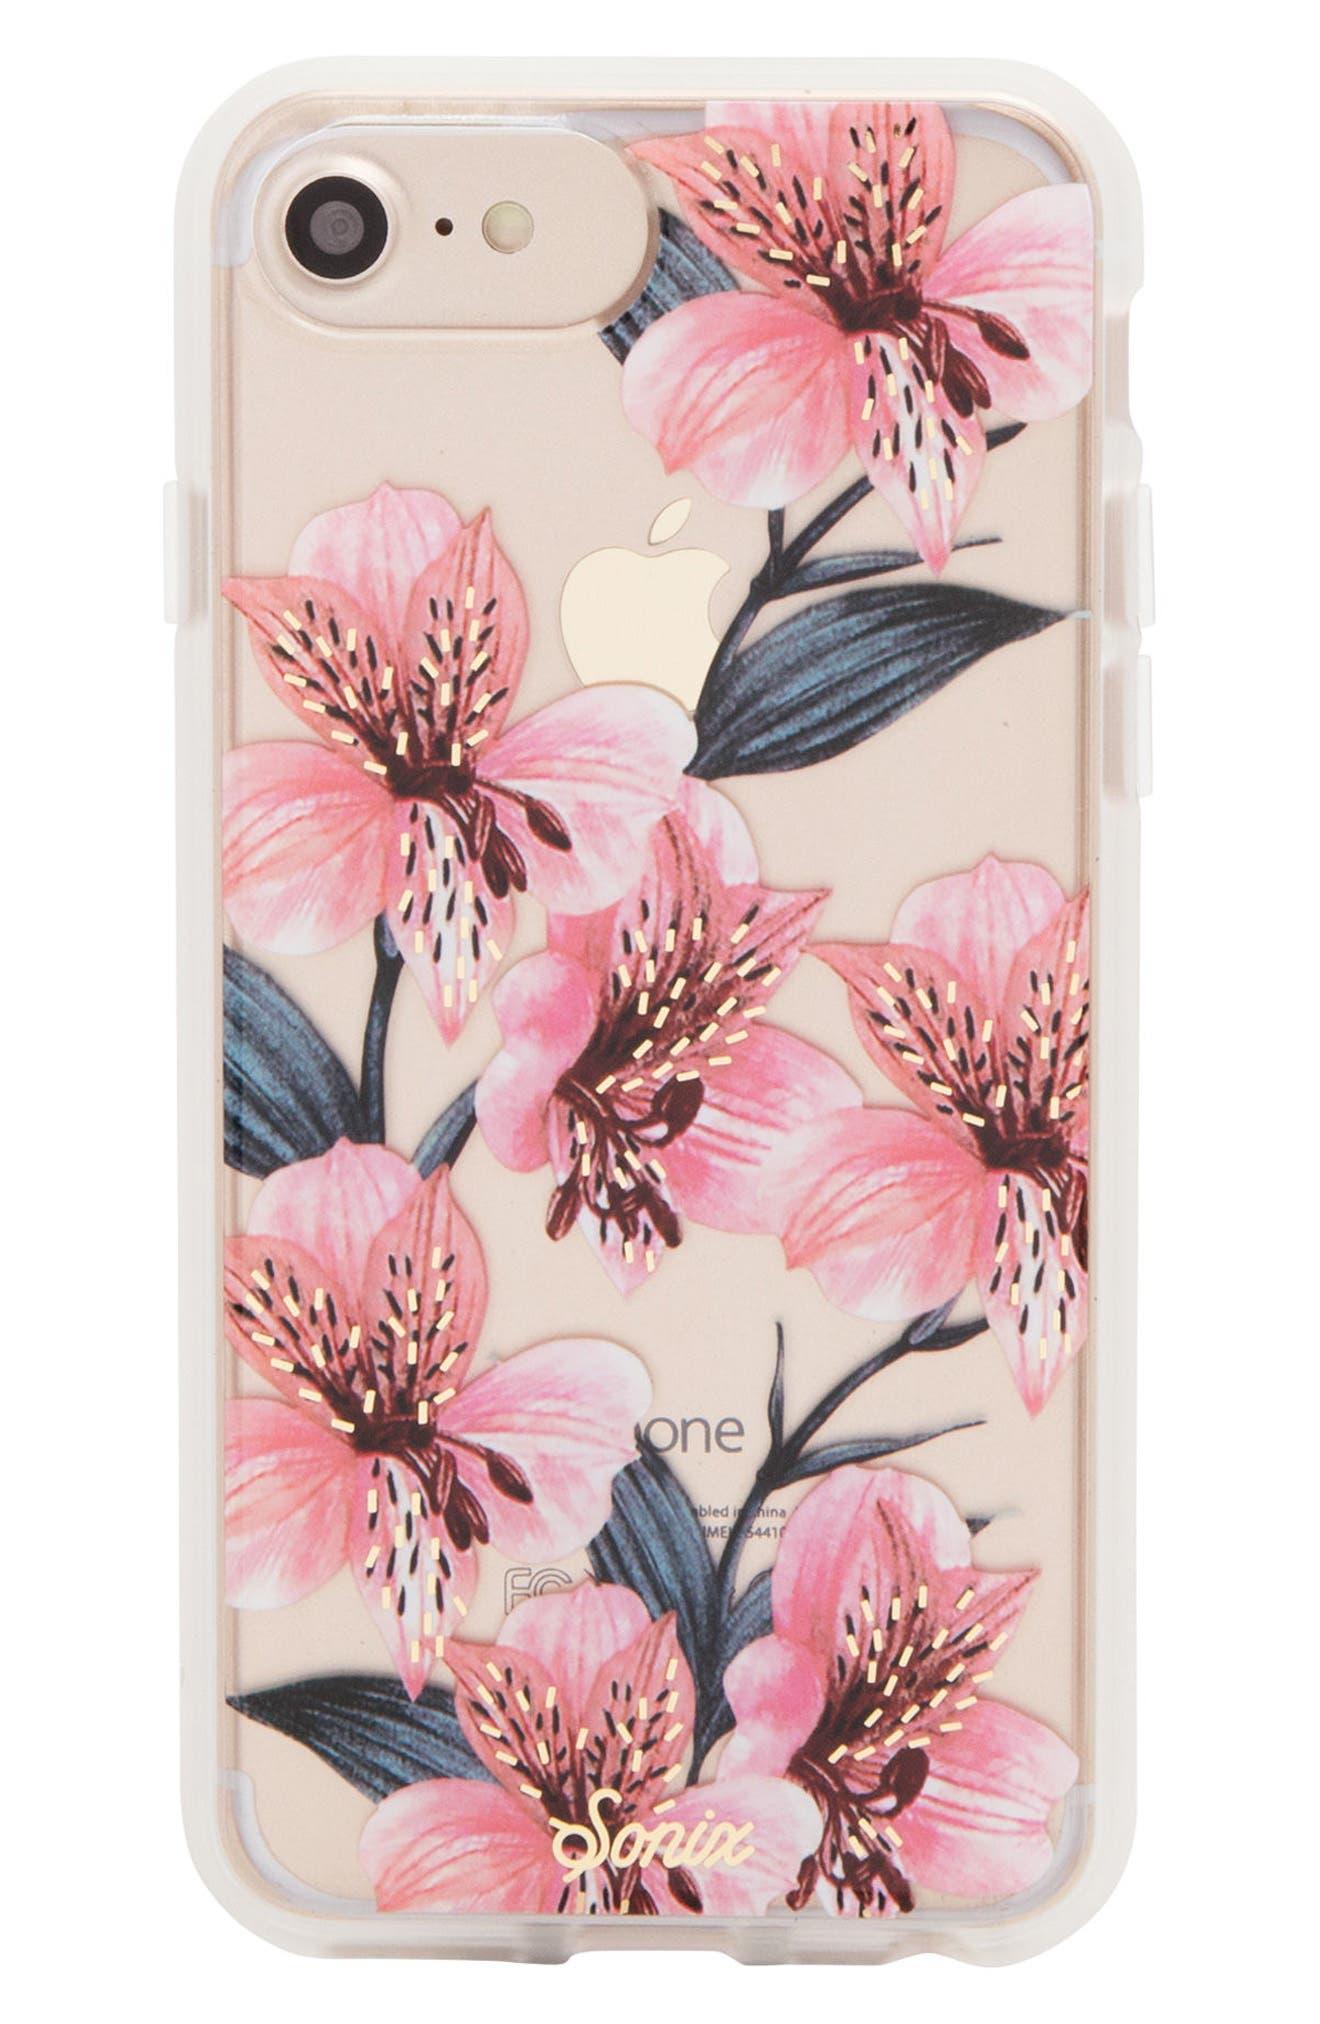 Tiger Lily iPhone 6/6s/7/8 & 6/6s/7/8 Plus Case,                             Main thumbnail 1, color,                             650